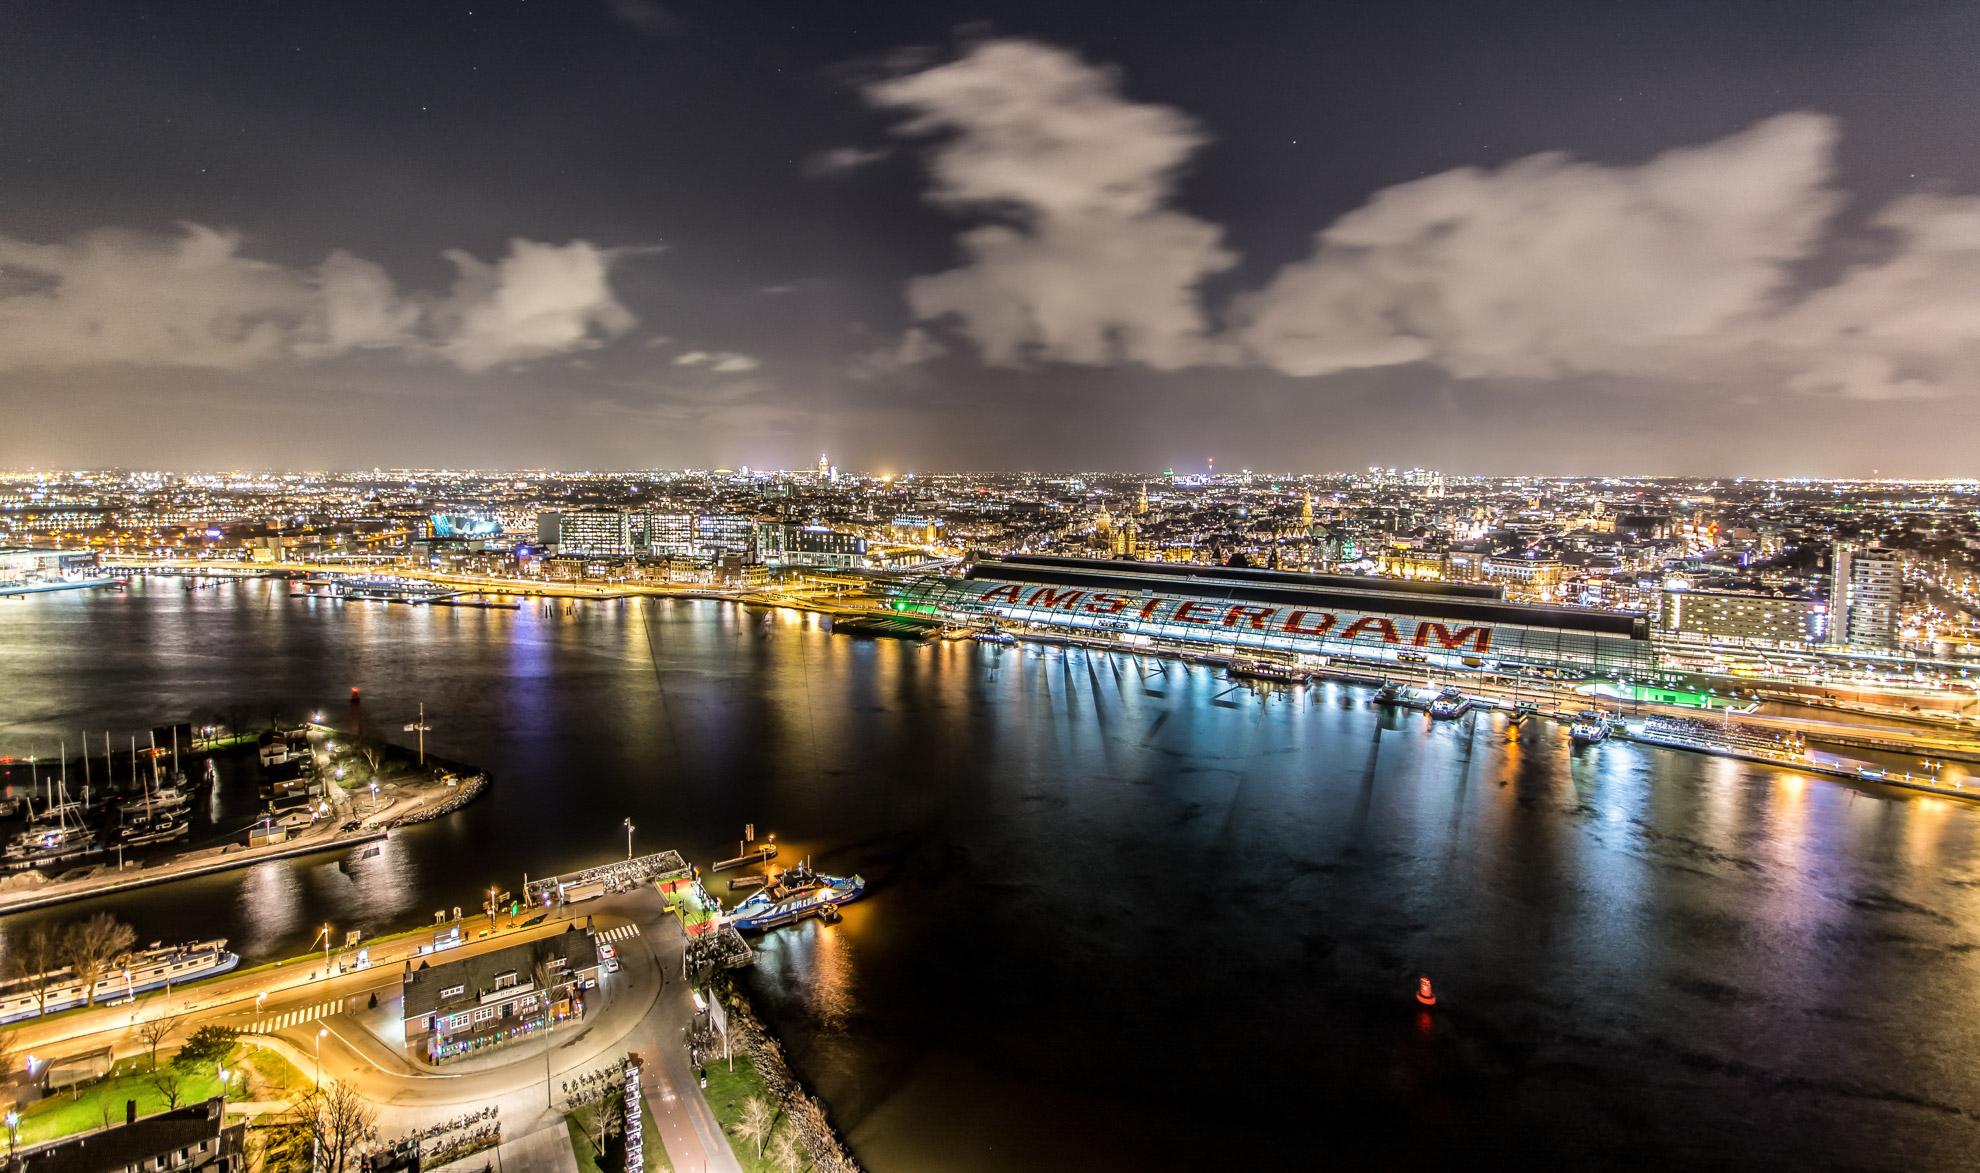 Over Nachtelijk Amsterdam, avondfotografie Amsterdam, avondfoto's Amsterdam, nachtfotografie Amsterdam, On top of Amsterdam